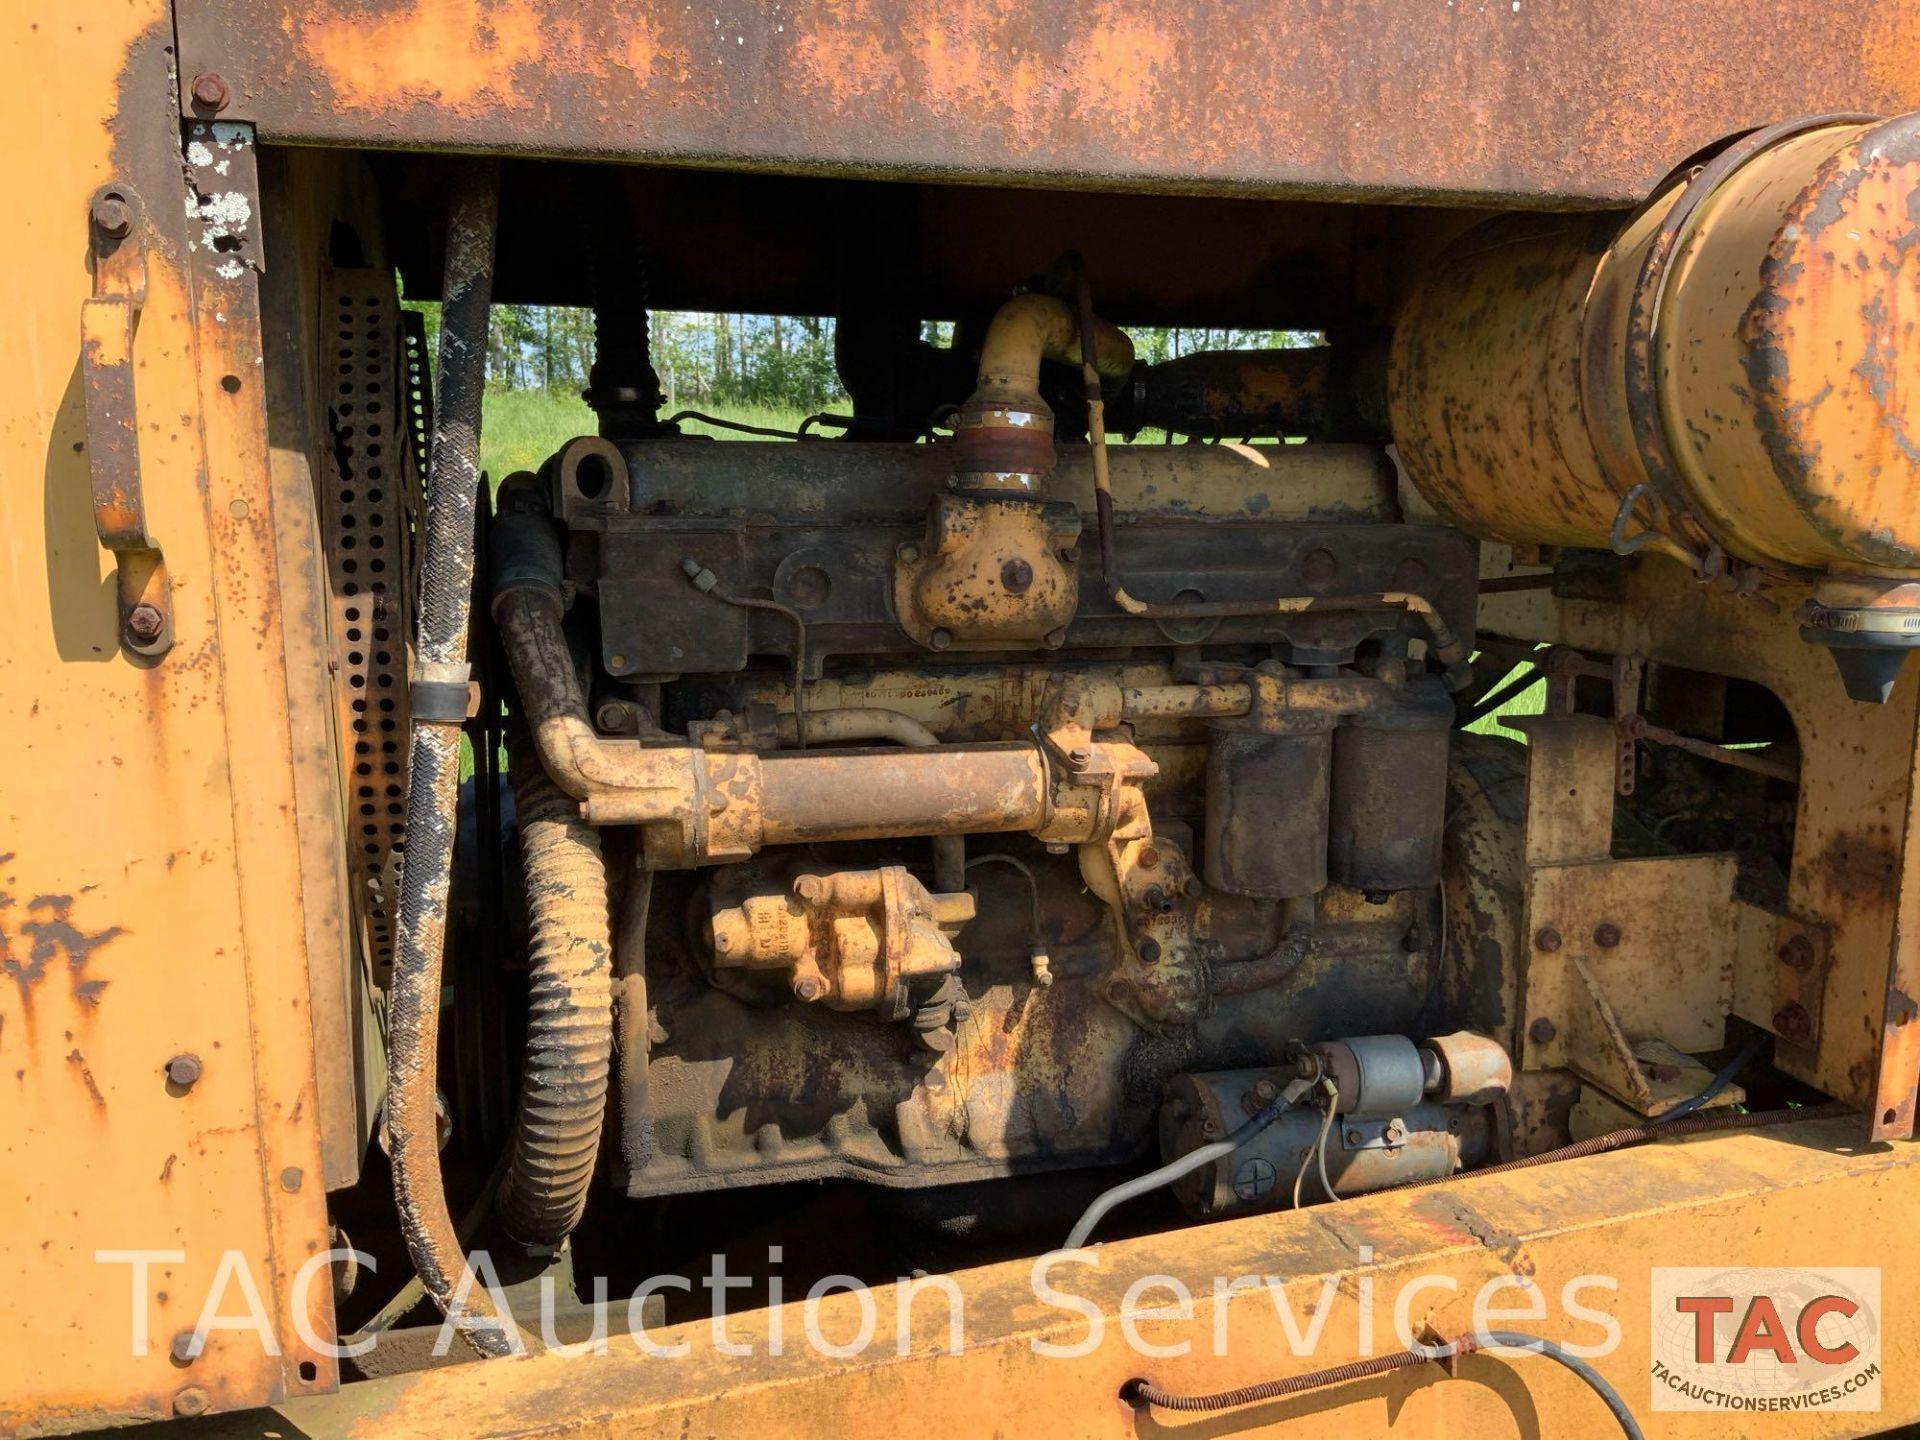 Galion T-500L Motor Grader - Image 15 of 28